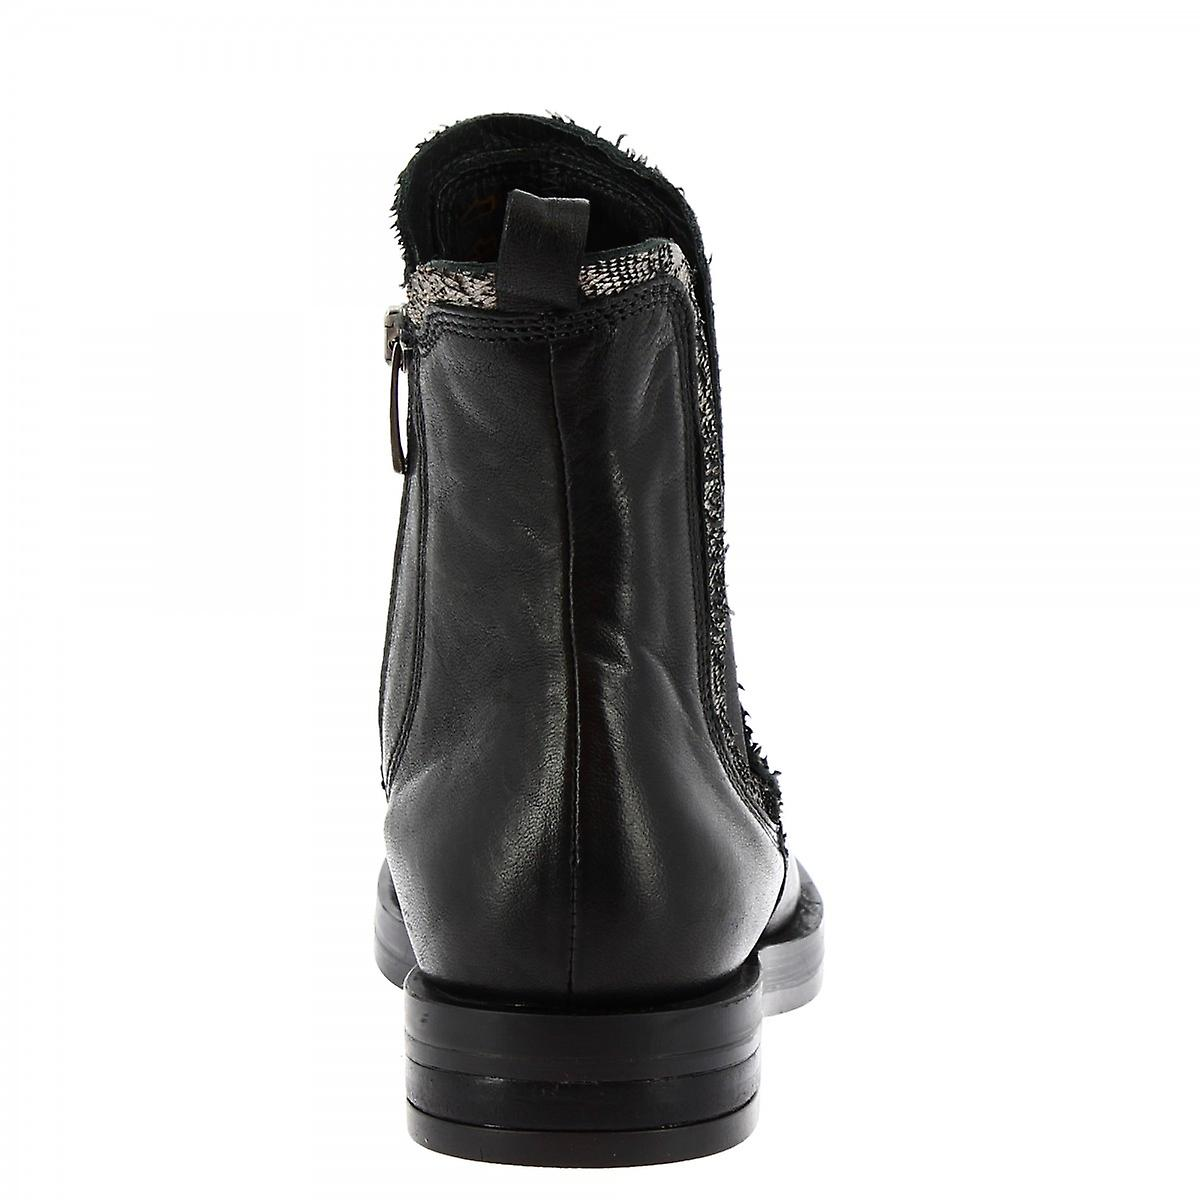 Leonardo Shoes Women's Handmade Fashion Chelsea Boots Black Calf Leather